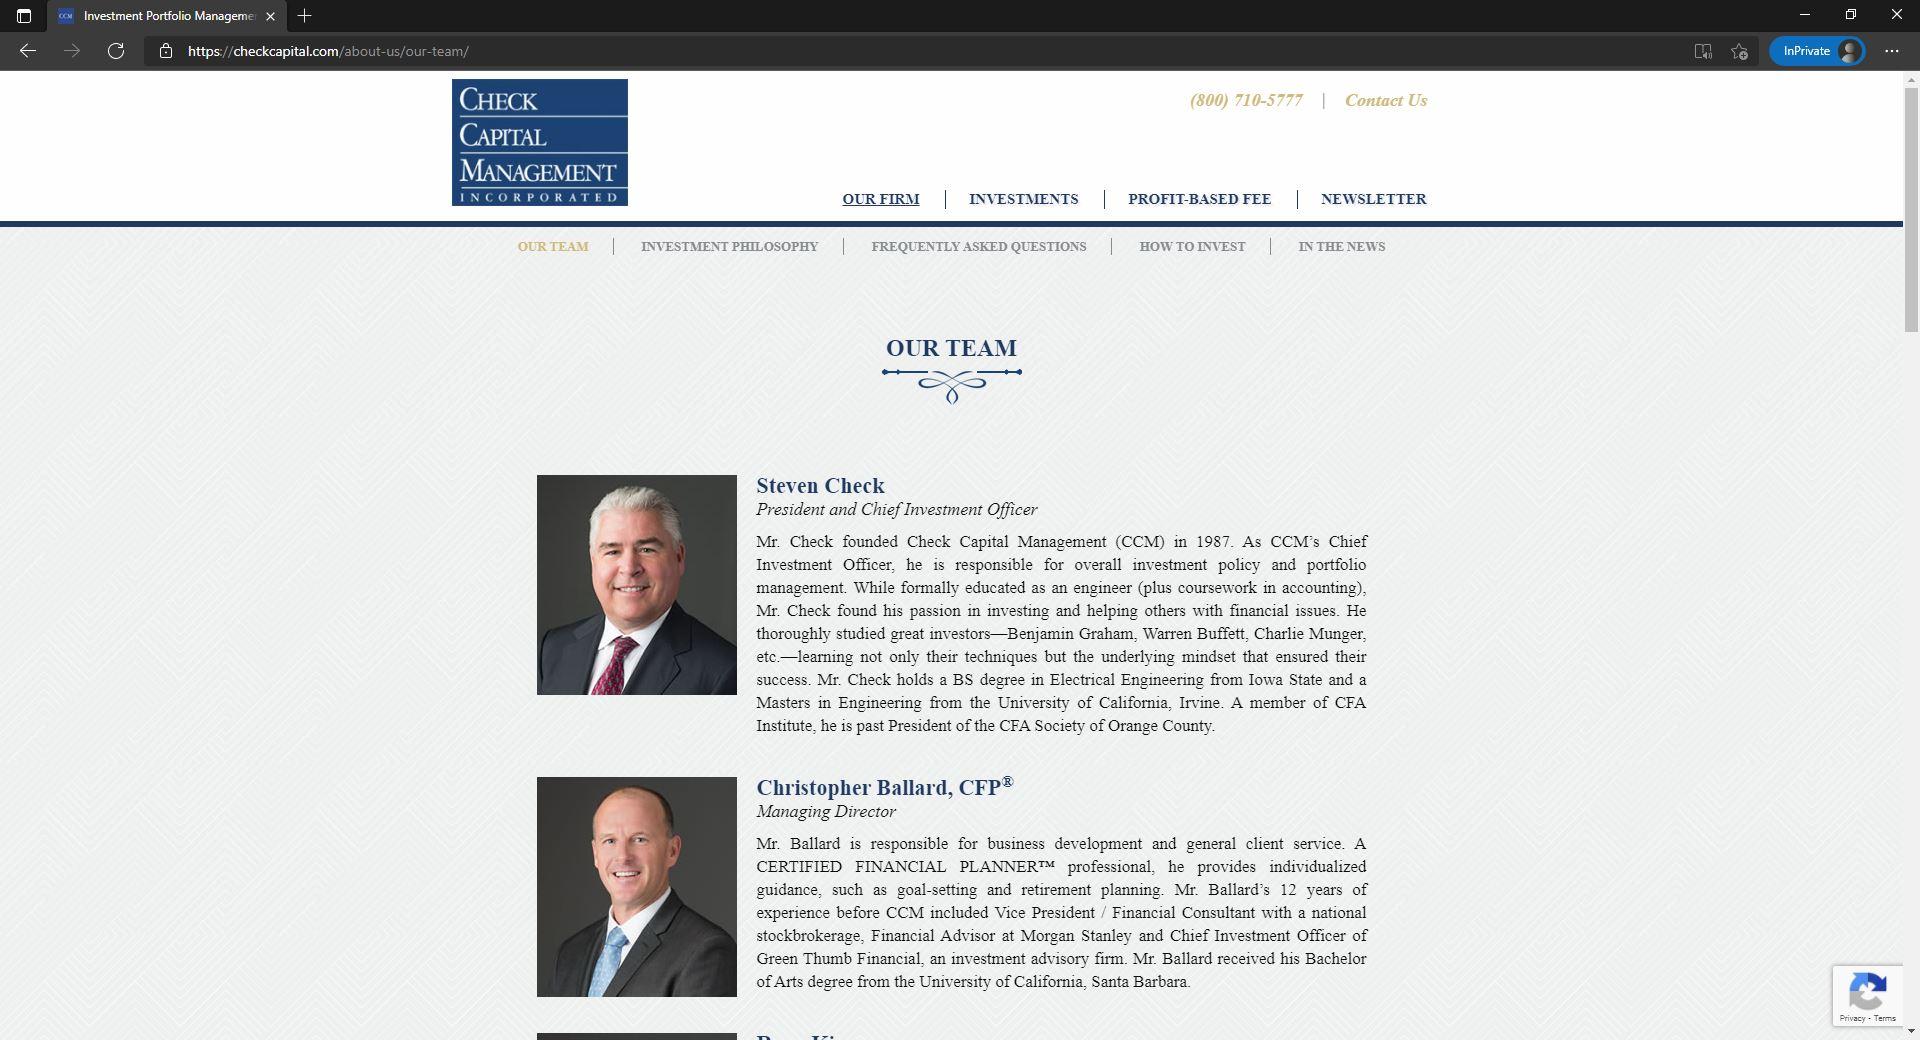 Check Capital Management website